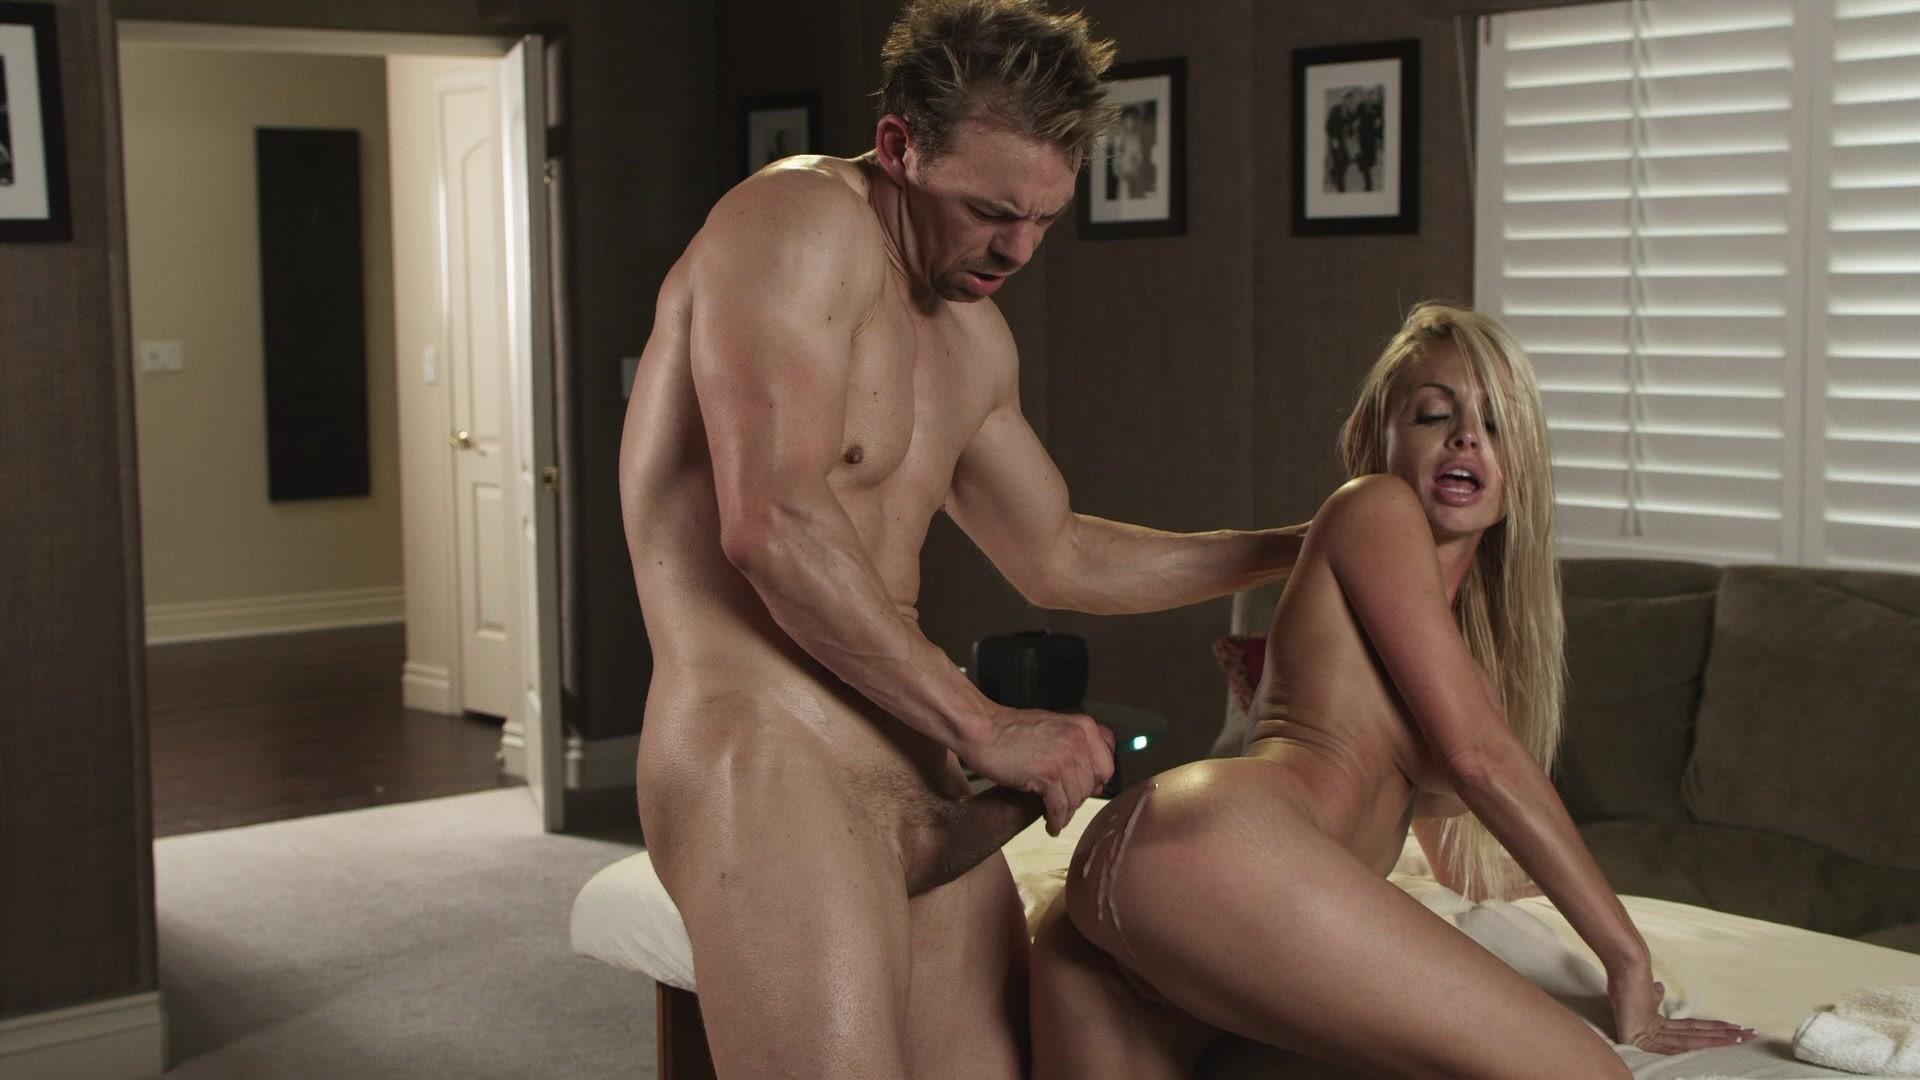 jesse-franco-streaming-movie-erotic-bbw-defloration-full-movie